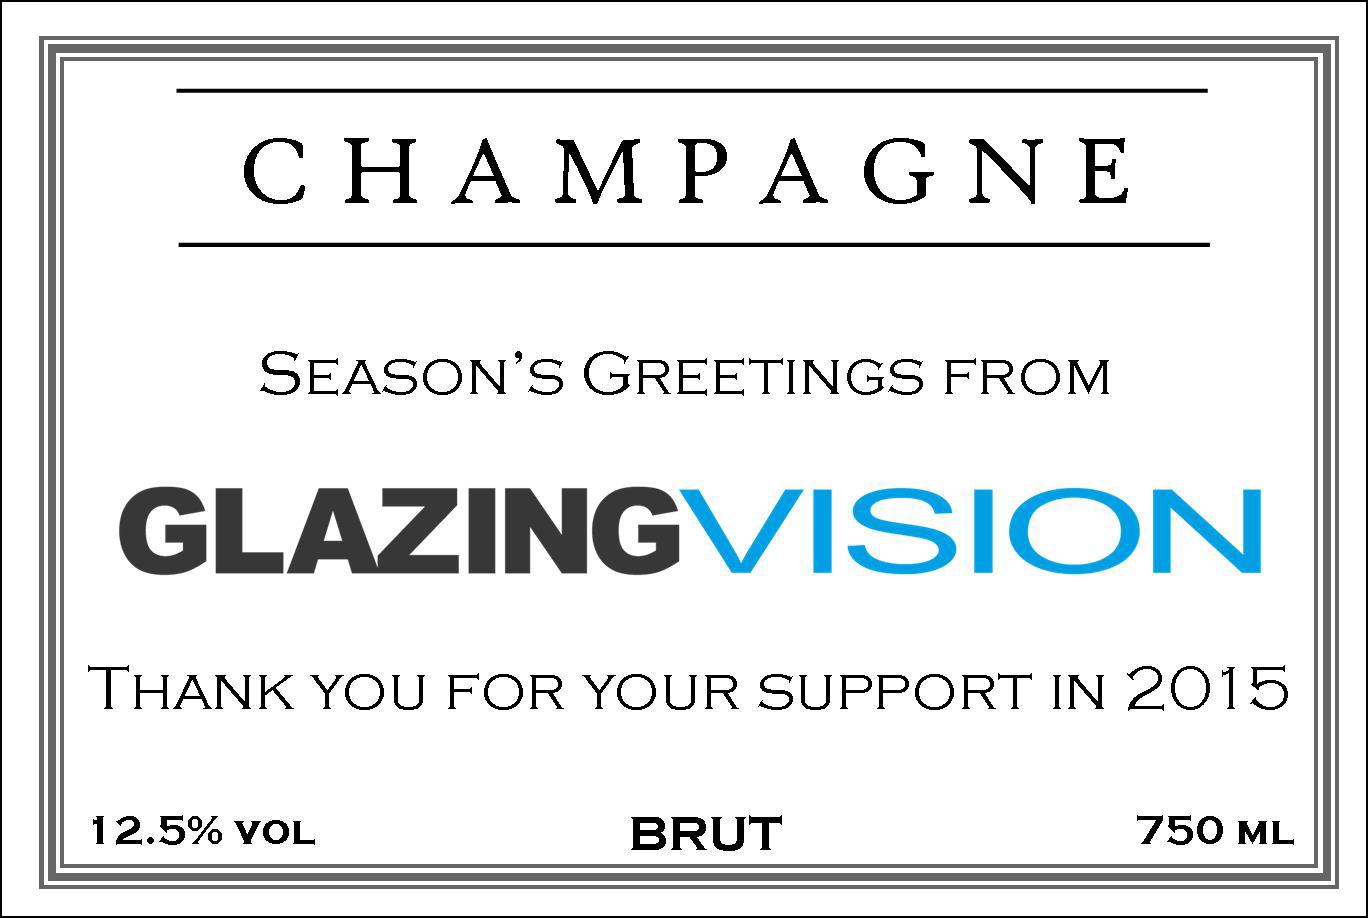 Glazing Vision  Branded Champagne